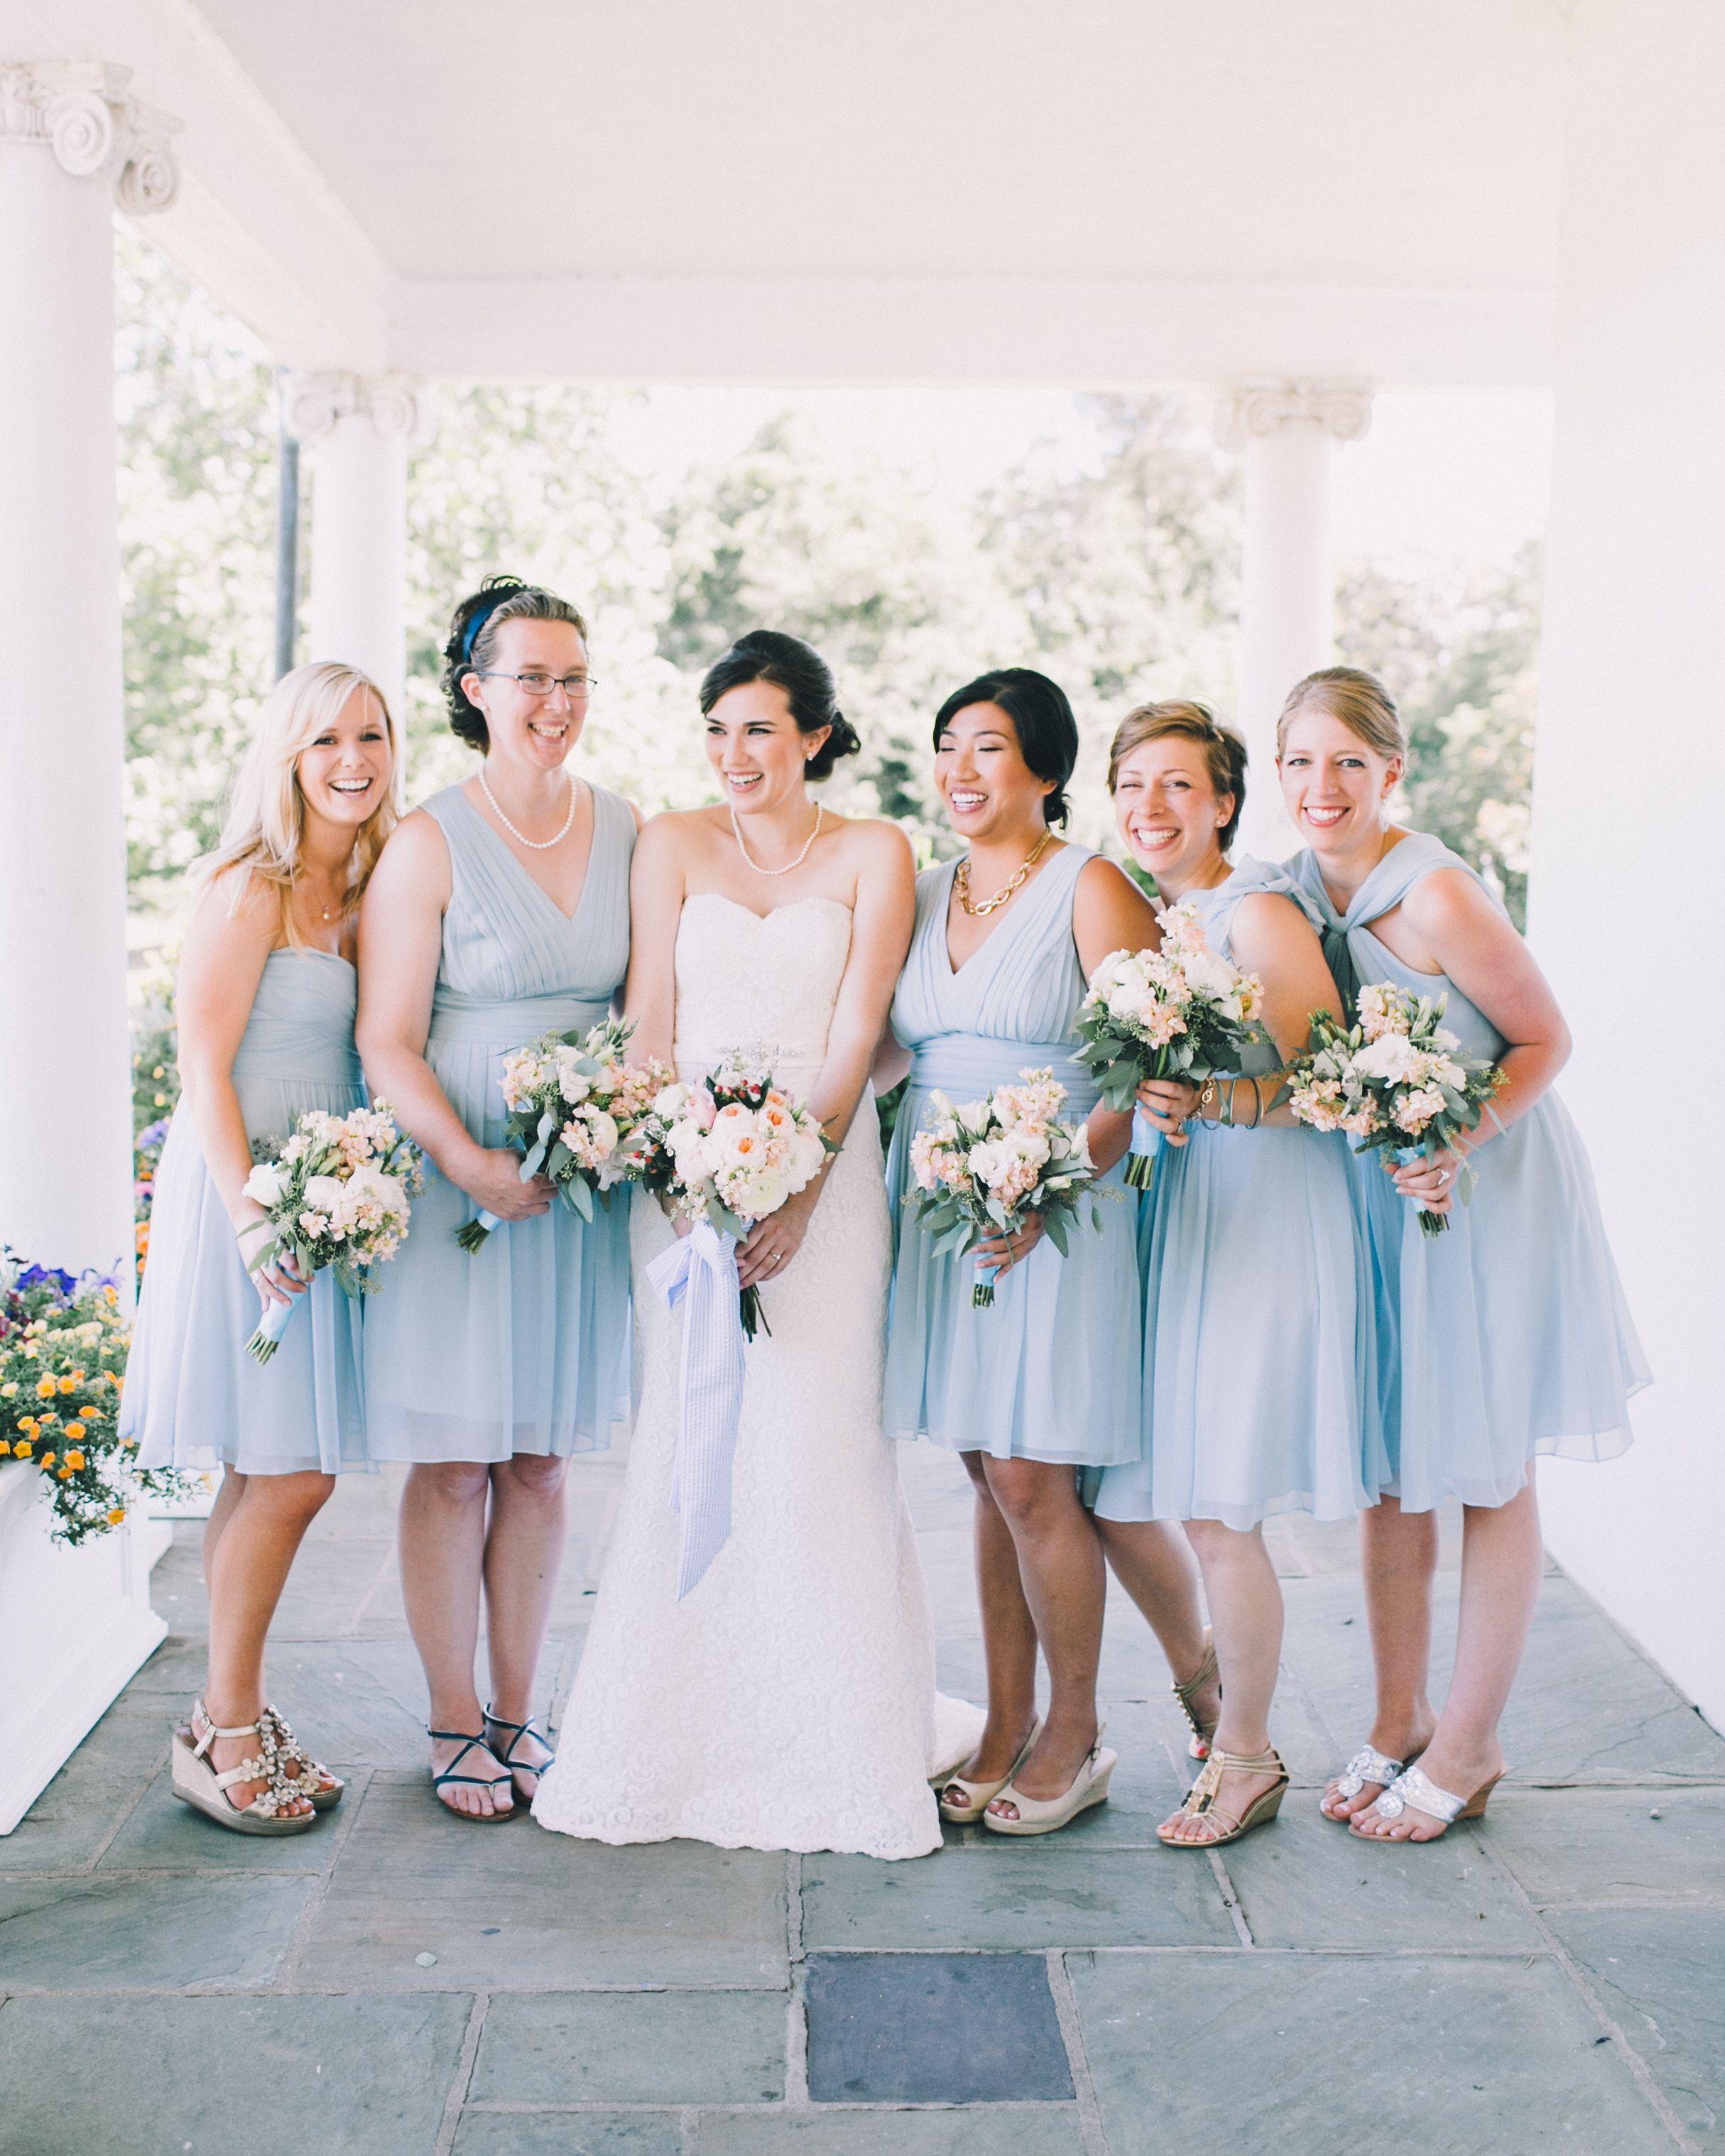 Bridesmaids in knee length powder blue dresses at summer wedding bridesmaids in knee length powder blue dresses at summer wedding ombrellifo Gallery